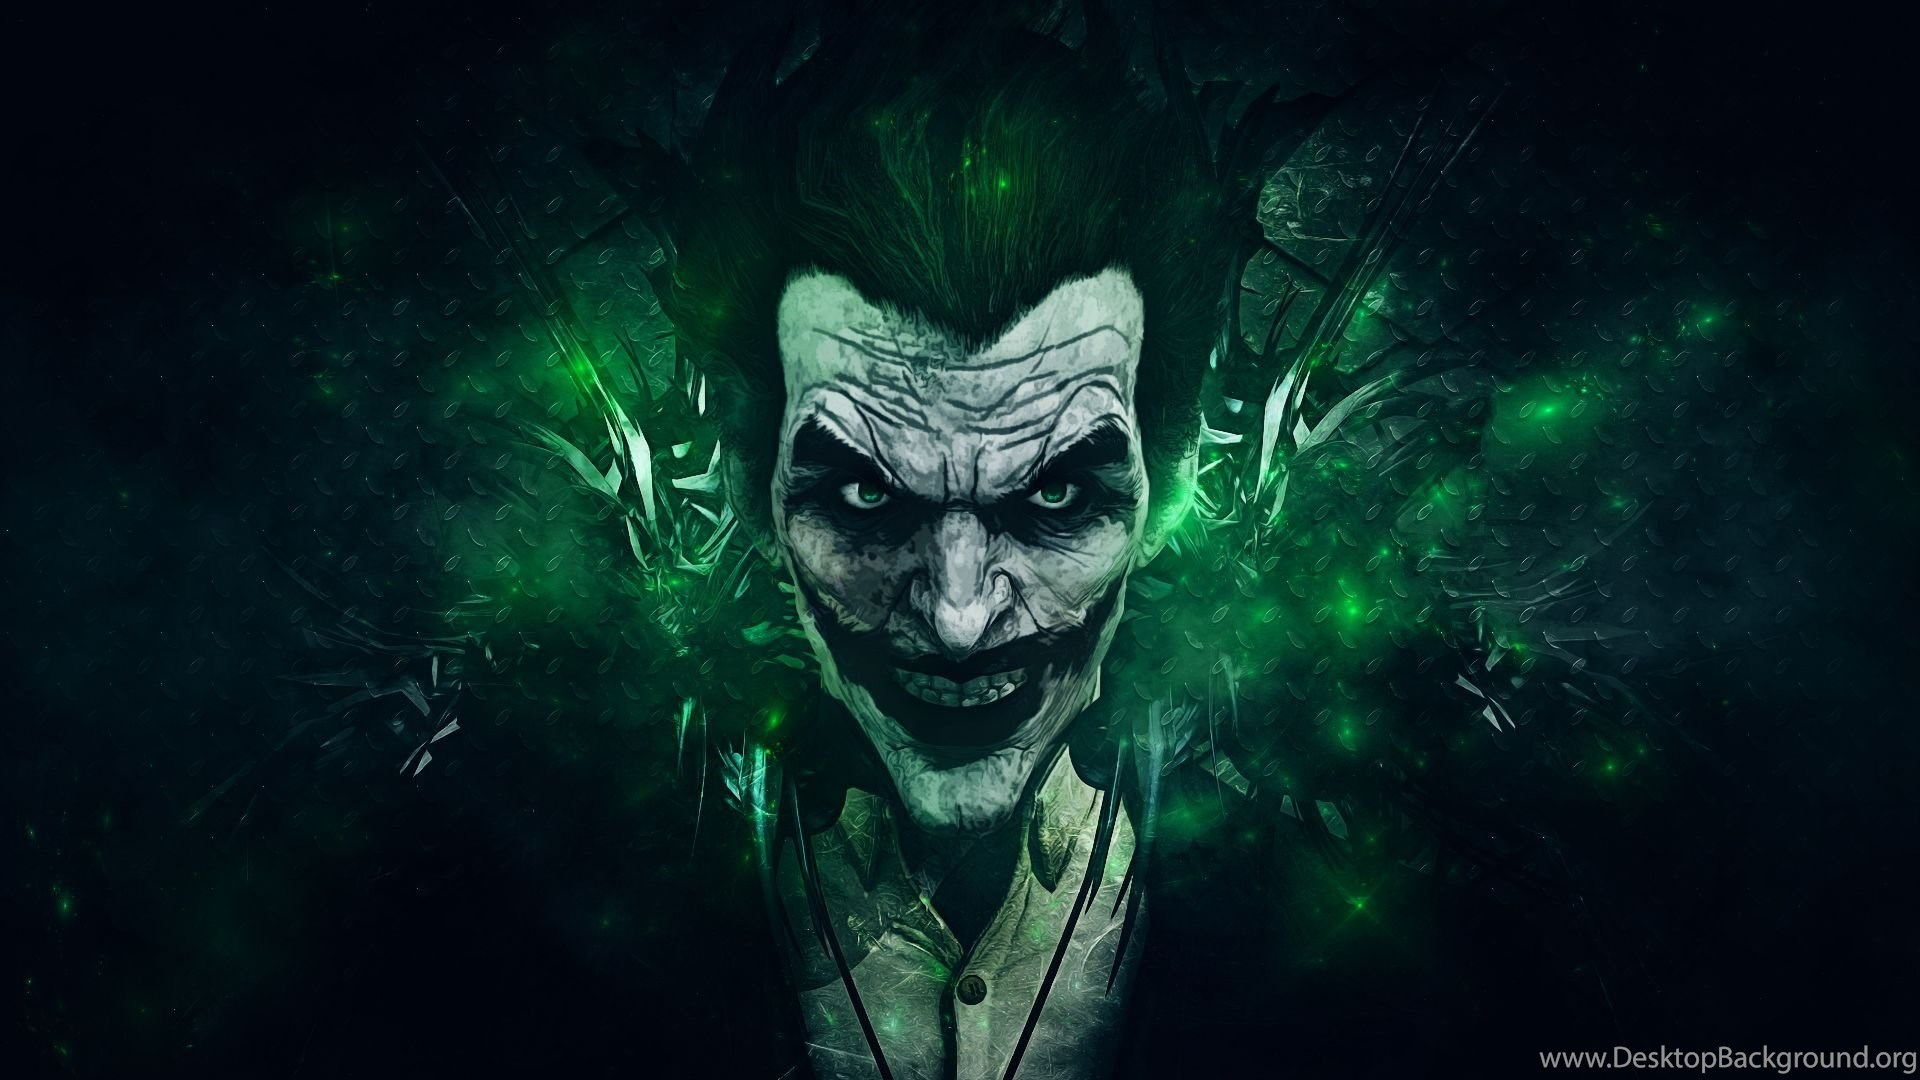 Full Hd 1080p Joker Wallpapers Hd Desktop Backgrounds 1920x1080